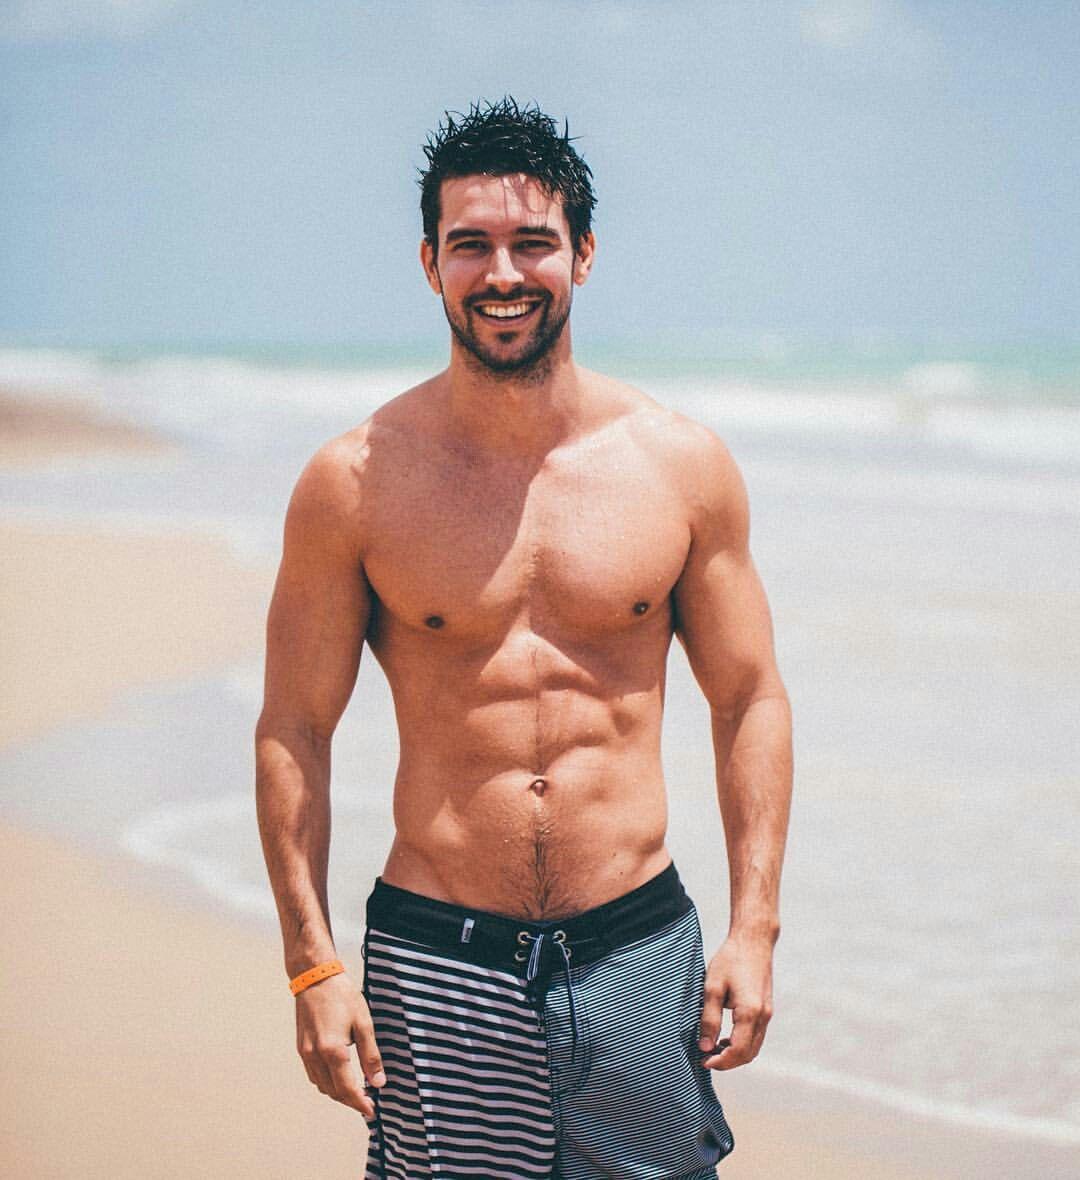 c8a5ea3530 Bernardo Velasco My Boys, Brazil, Swim Trunks, Sexy Men, Instagram Posts,